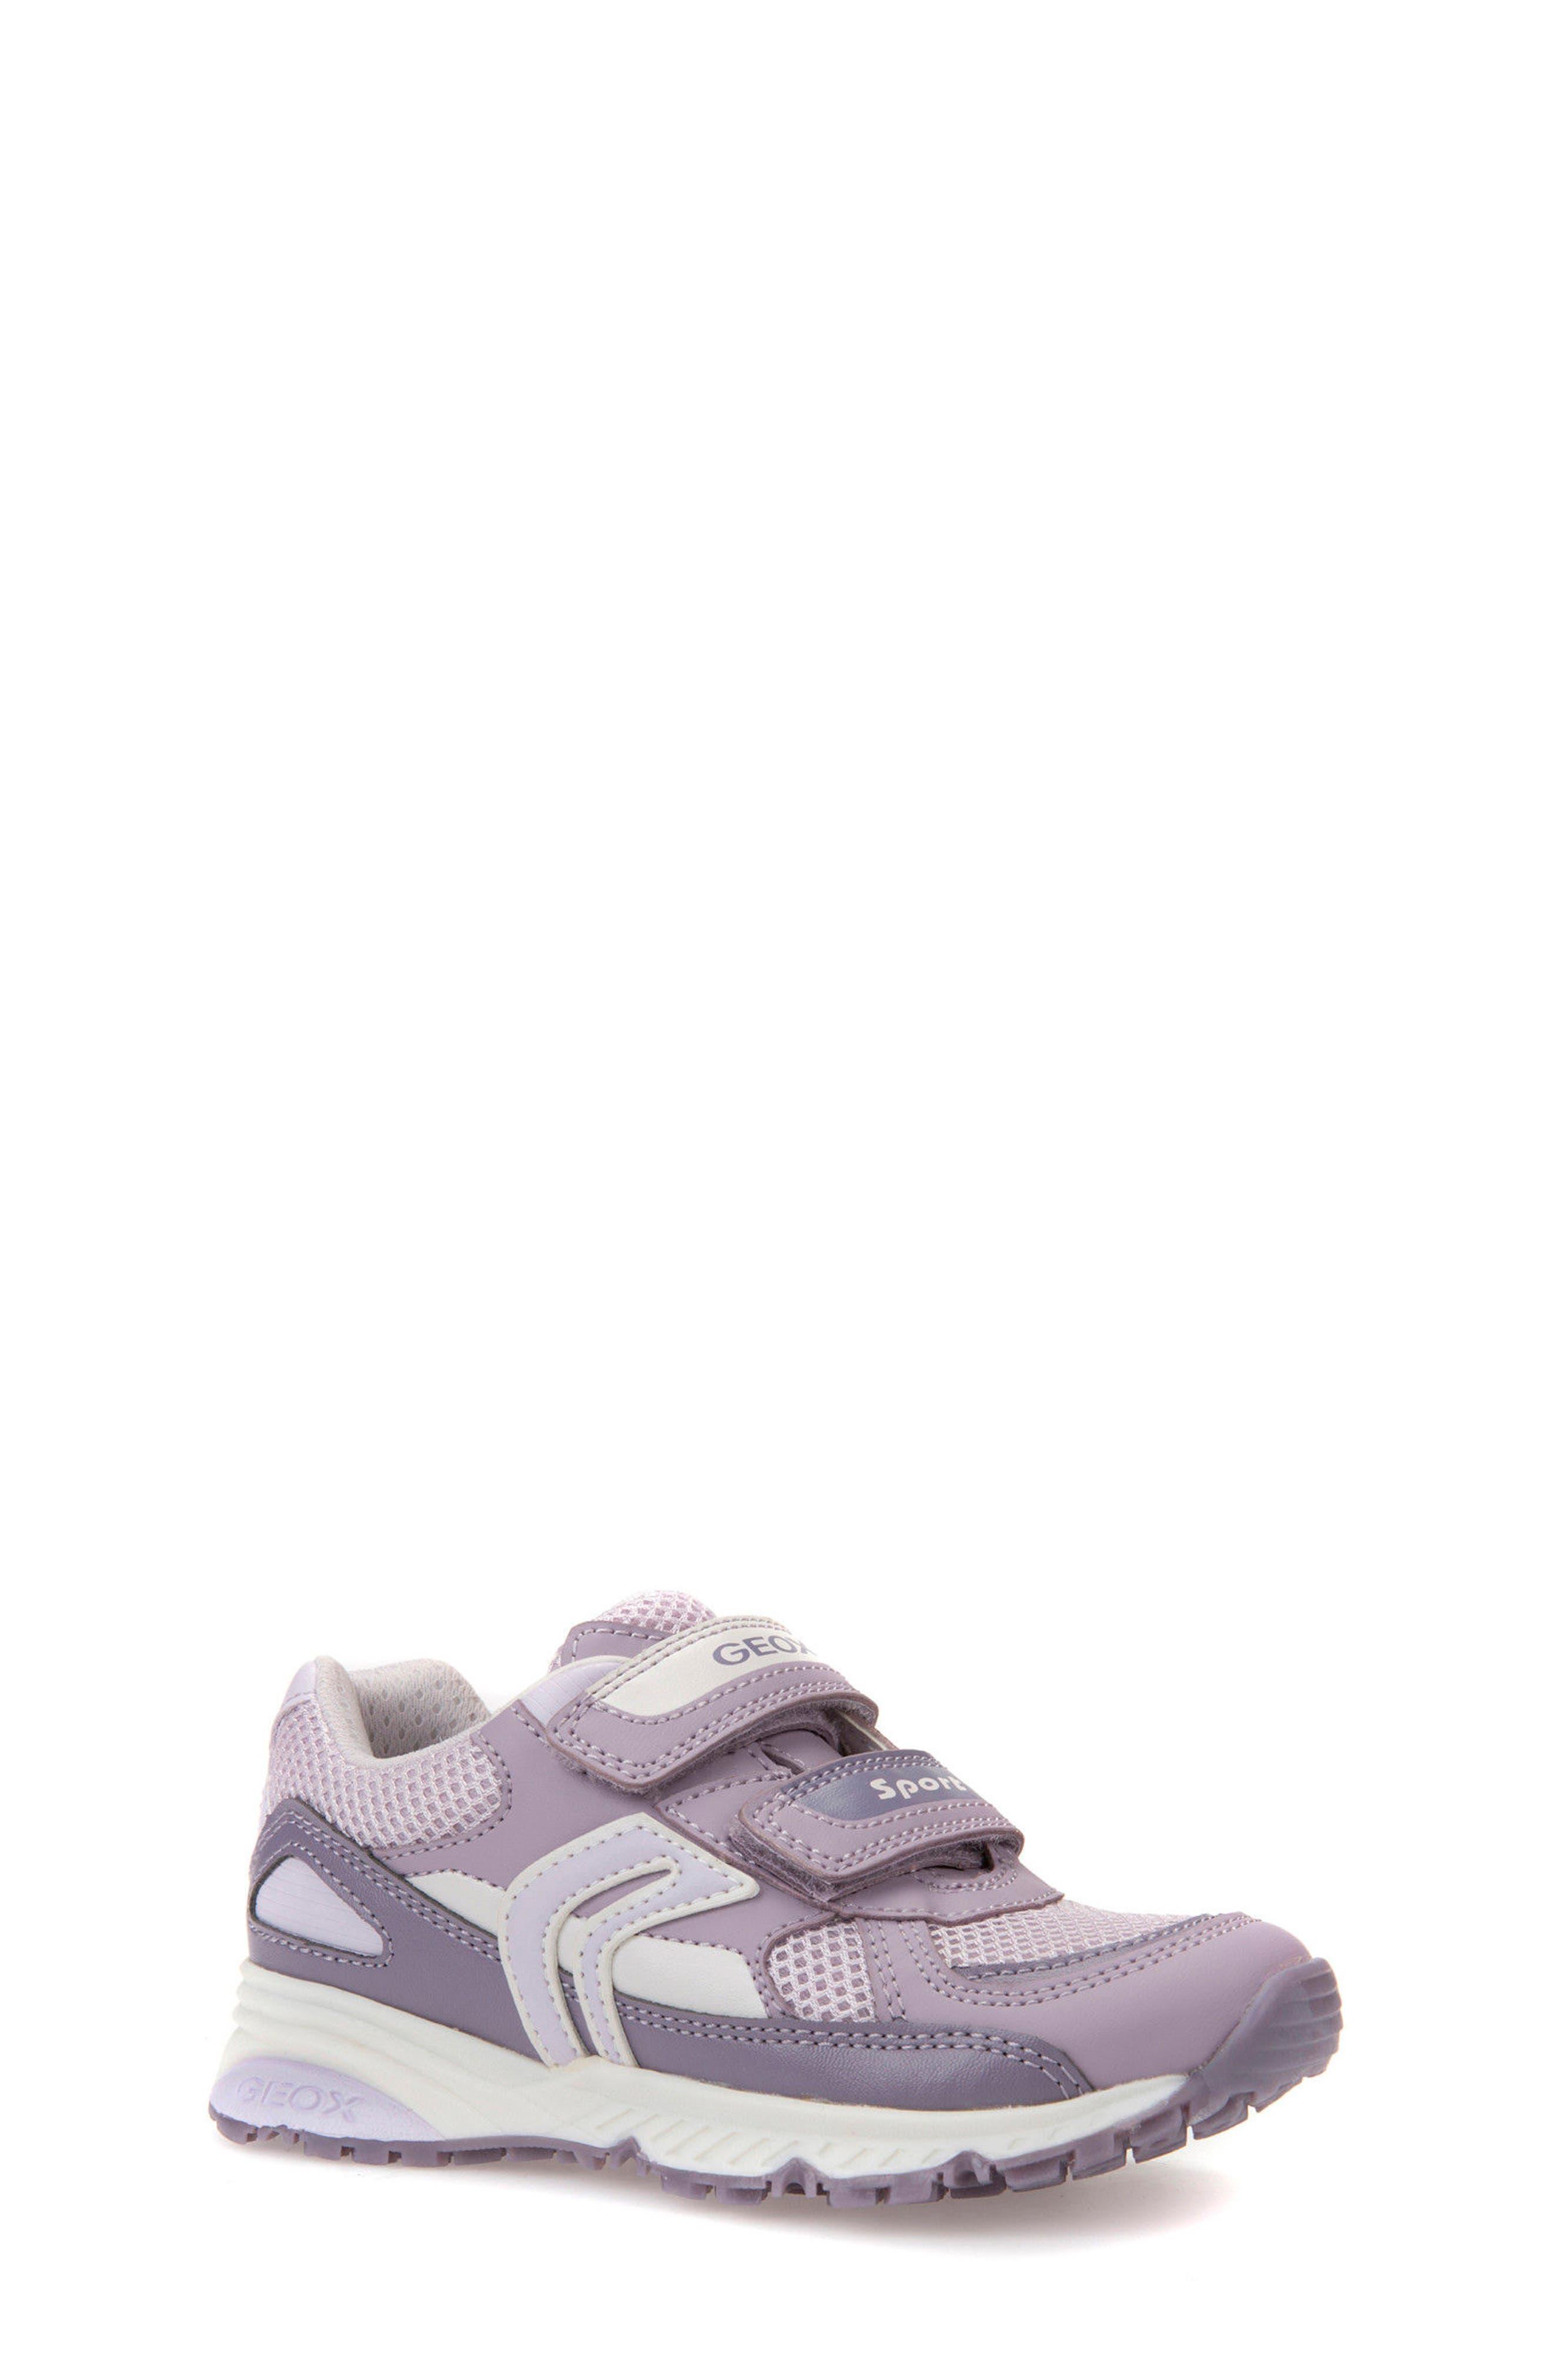 Bernie Sneaker,                         Main,                         color, Rose Smoke/ Light Lilac